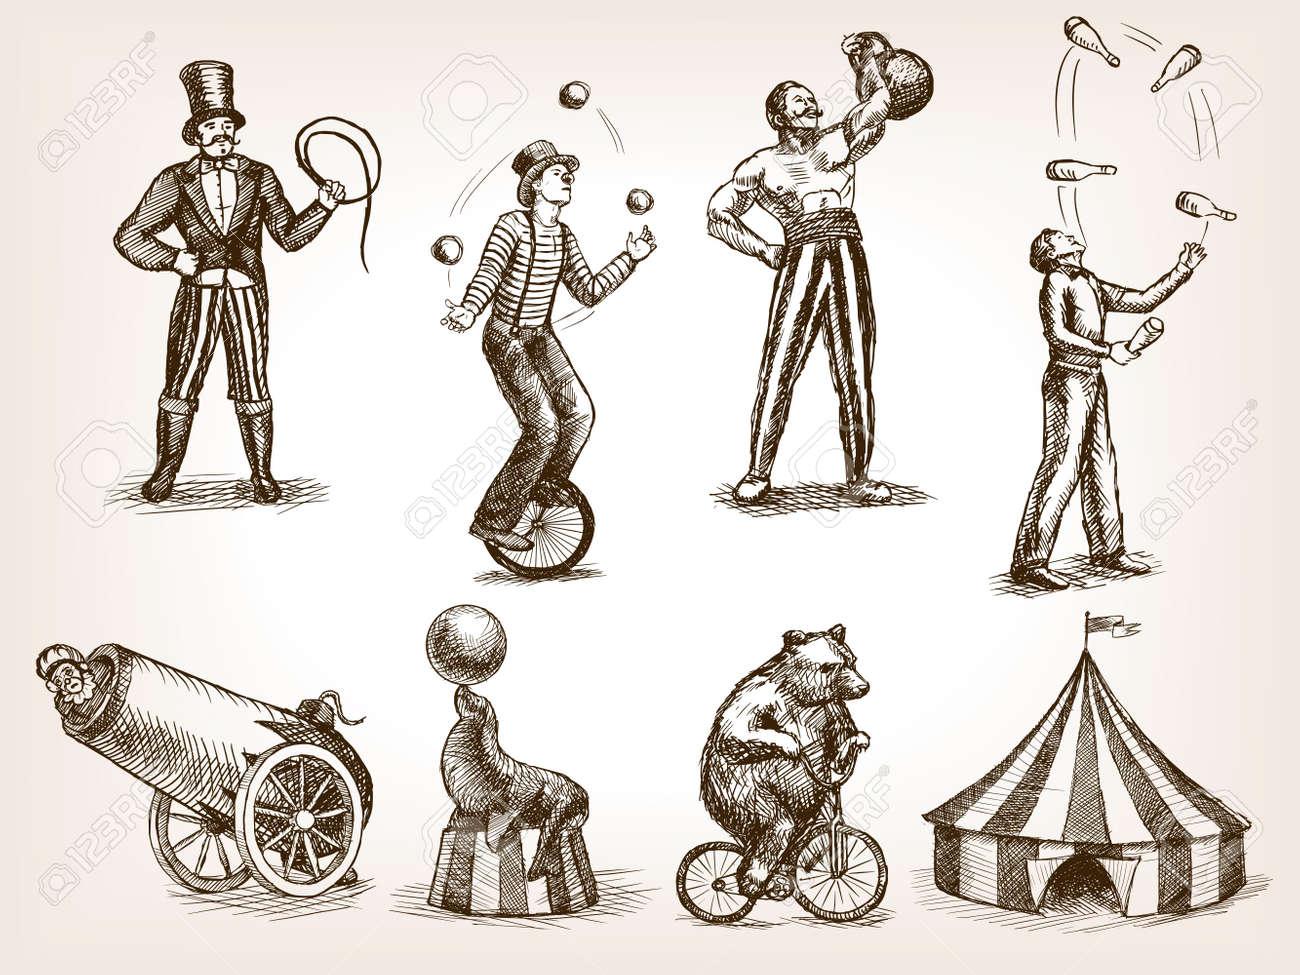 Retro circus performance set sketch style illustration. Old hengraving..